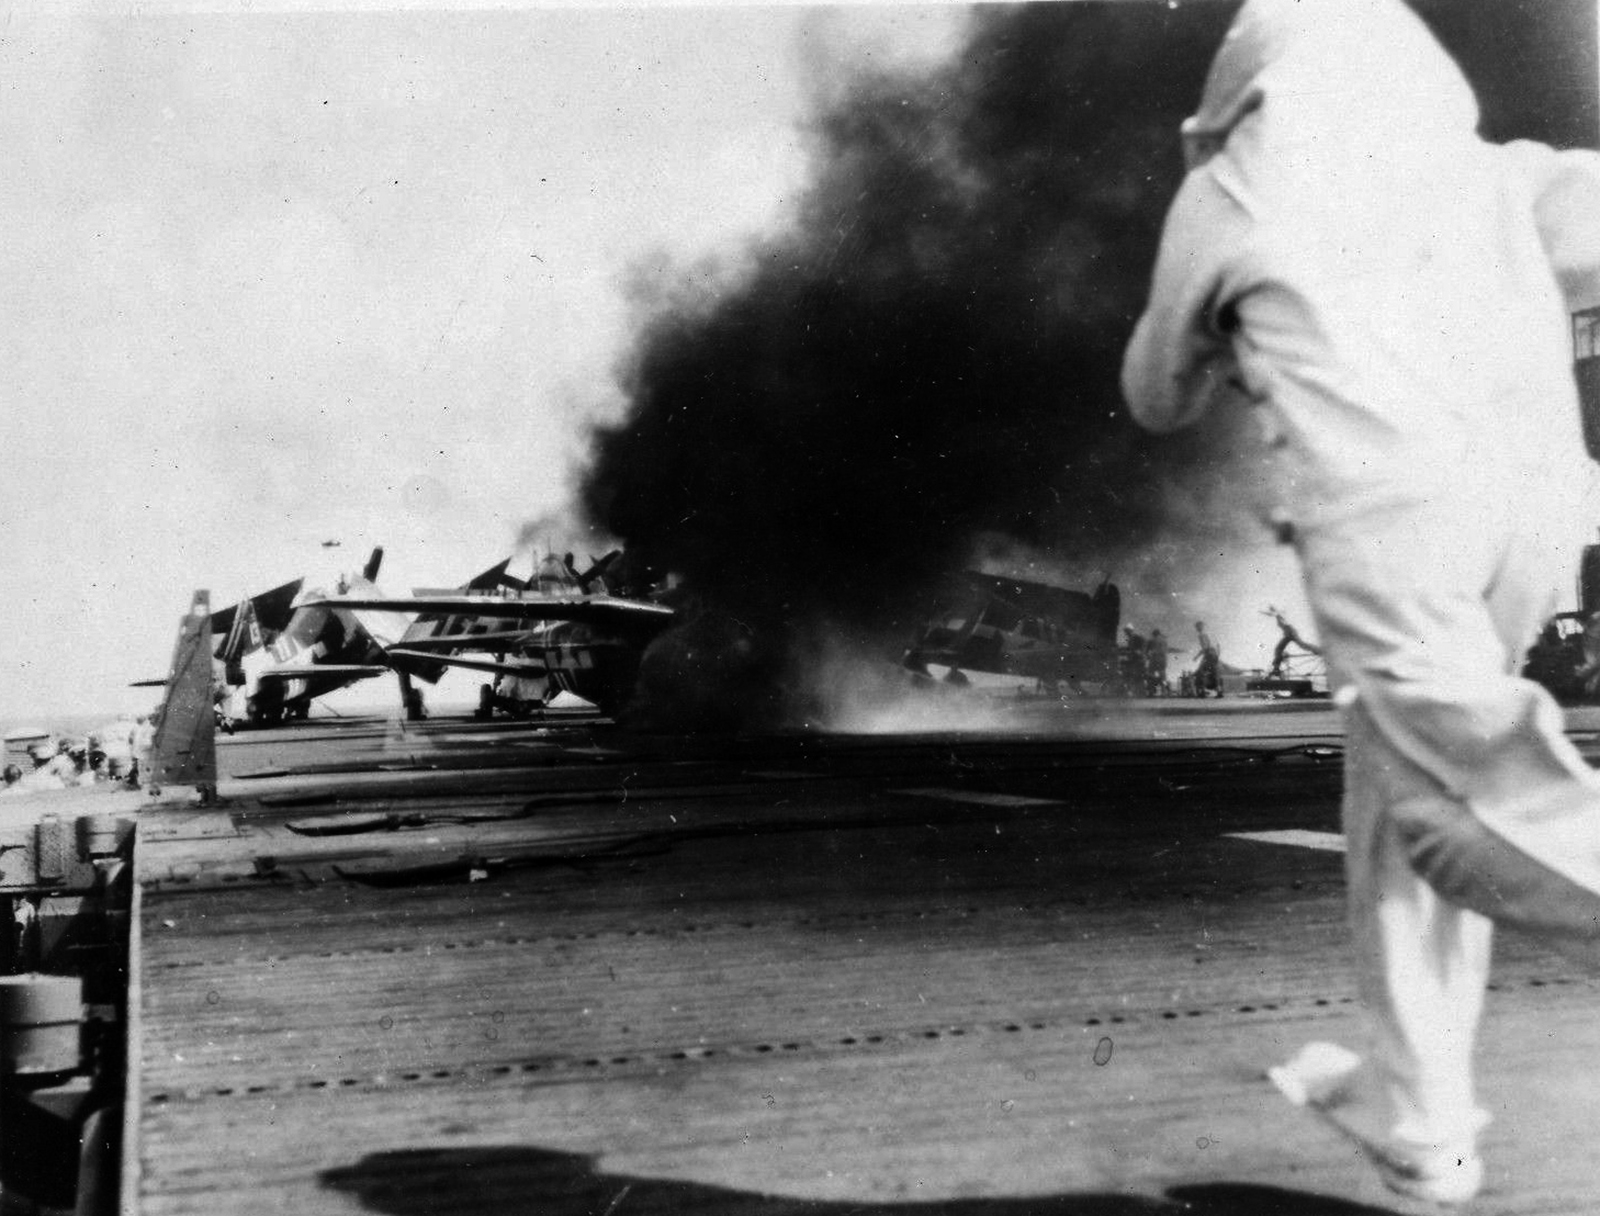 Grumman F6F 5 Hellcat VF 36 White 10 landing mishap CVE 112 USS Siboney Aug 1945 May 1946 04